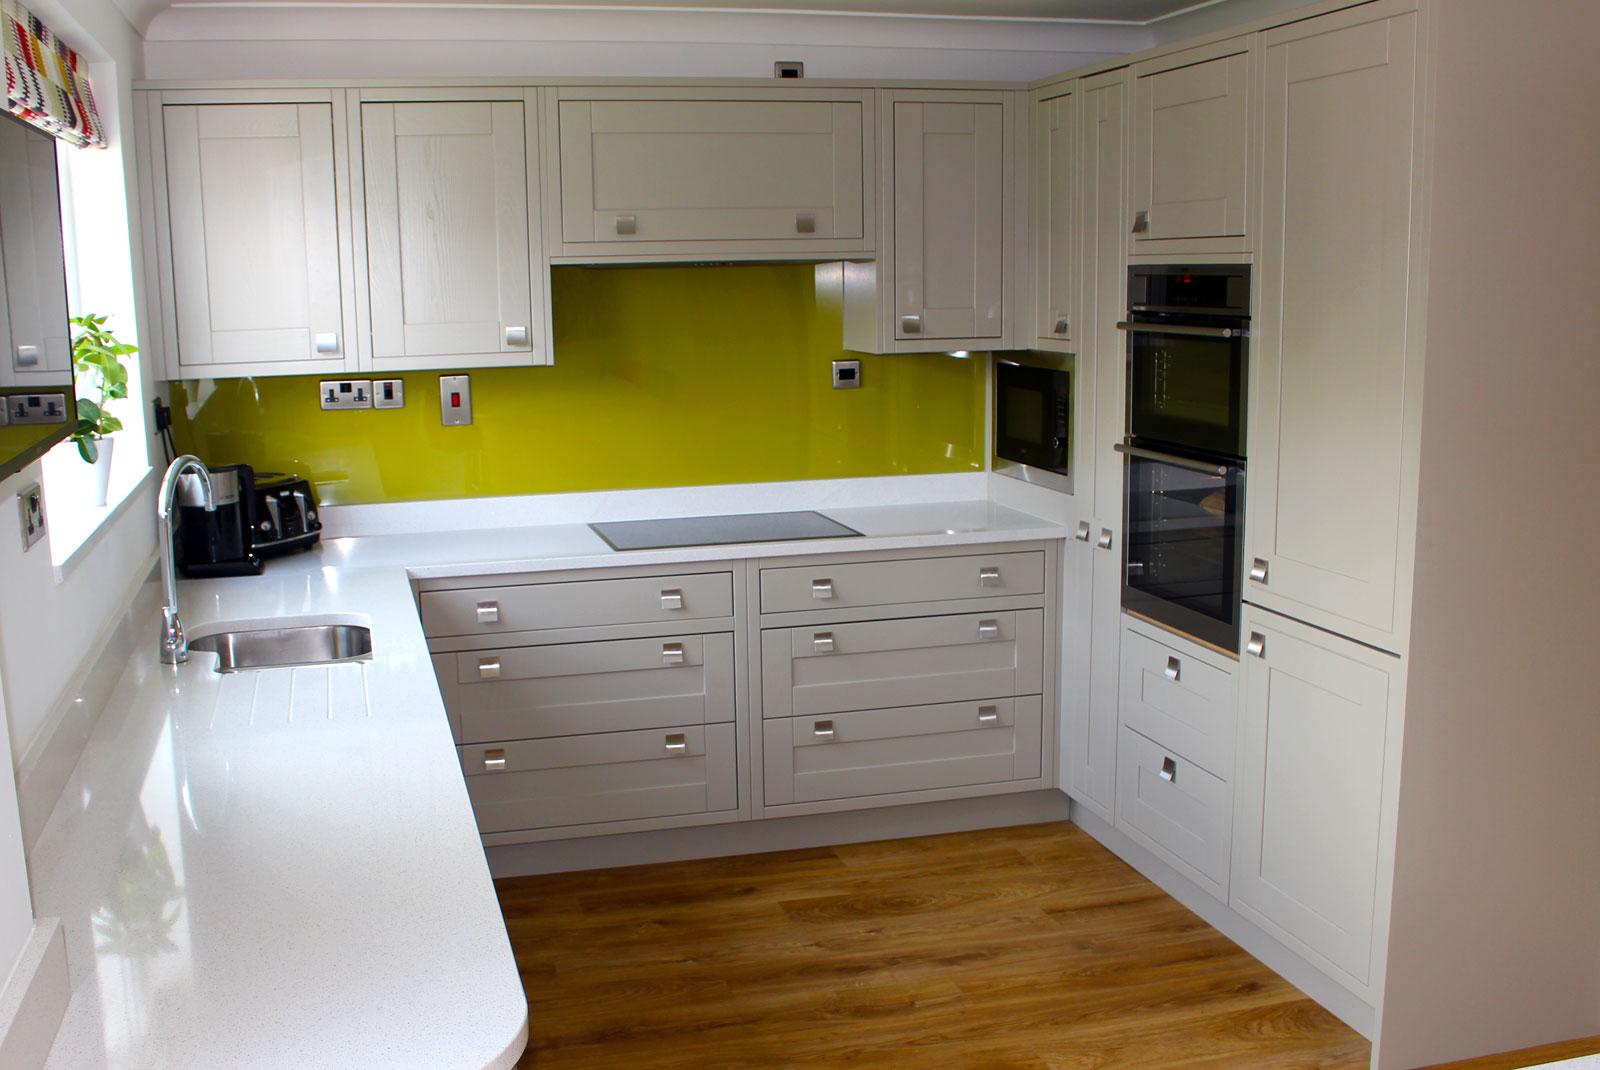 David from wolviston harewood dakar and oak would we for Diy kitchens com reviews